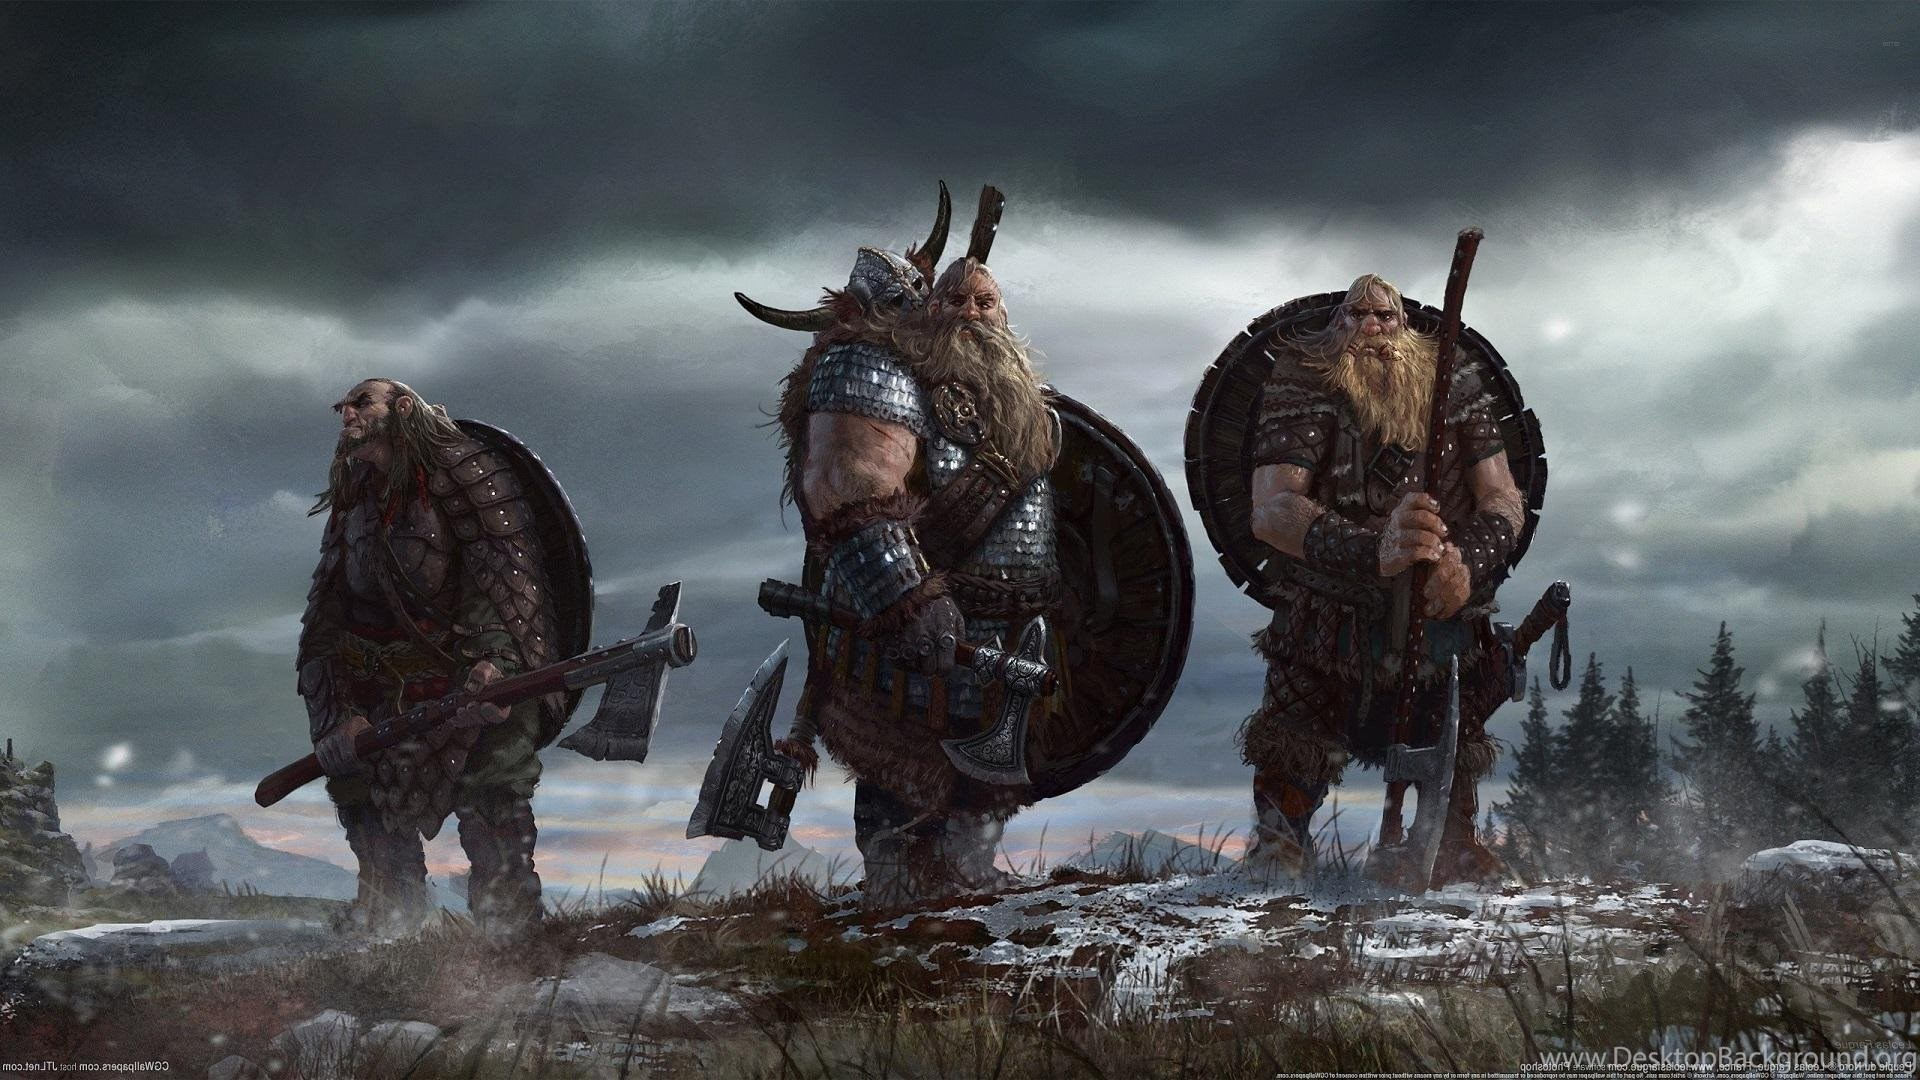 Vikings Wallpapers 13 Hd Wallpaper Wallpapers Pics The Best